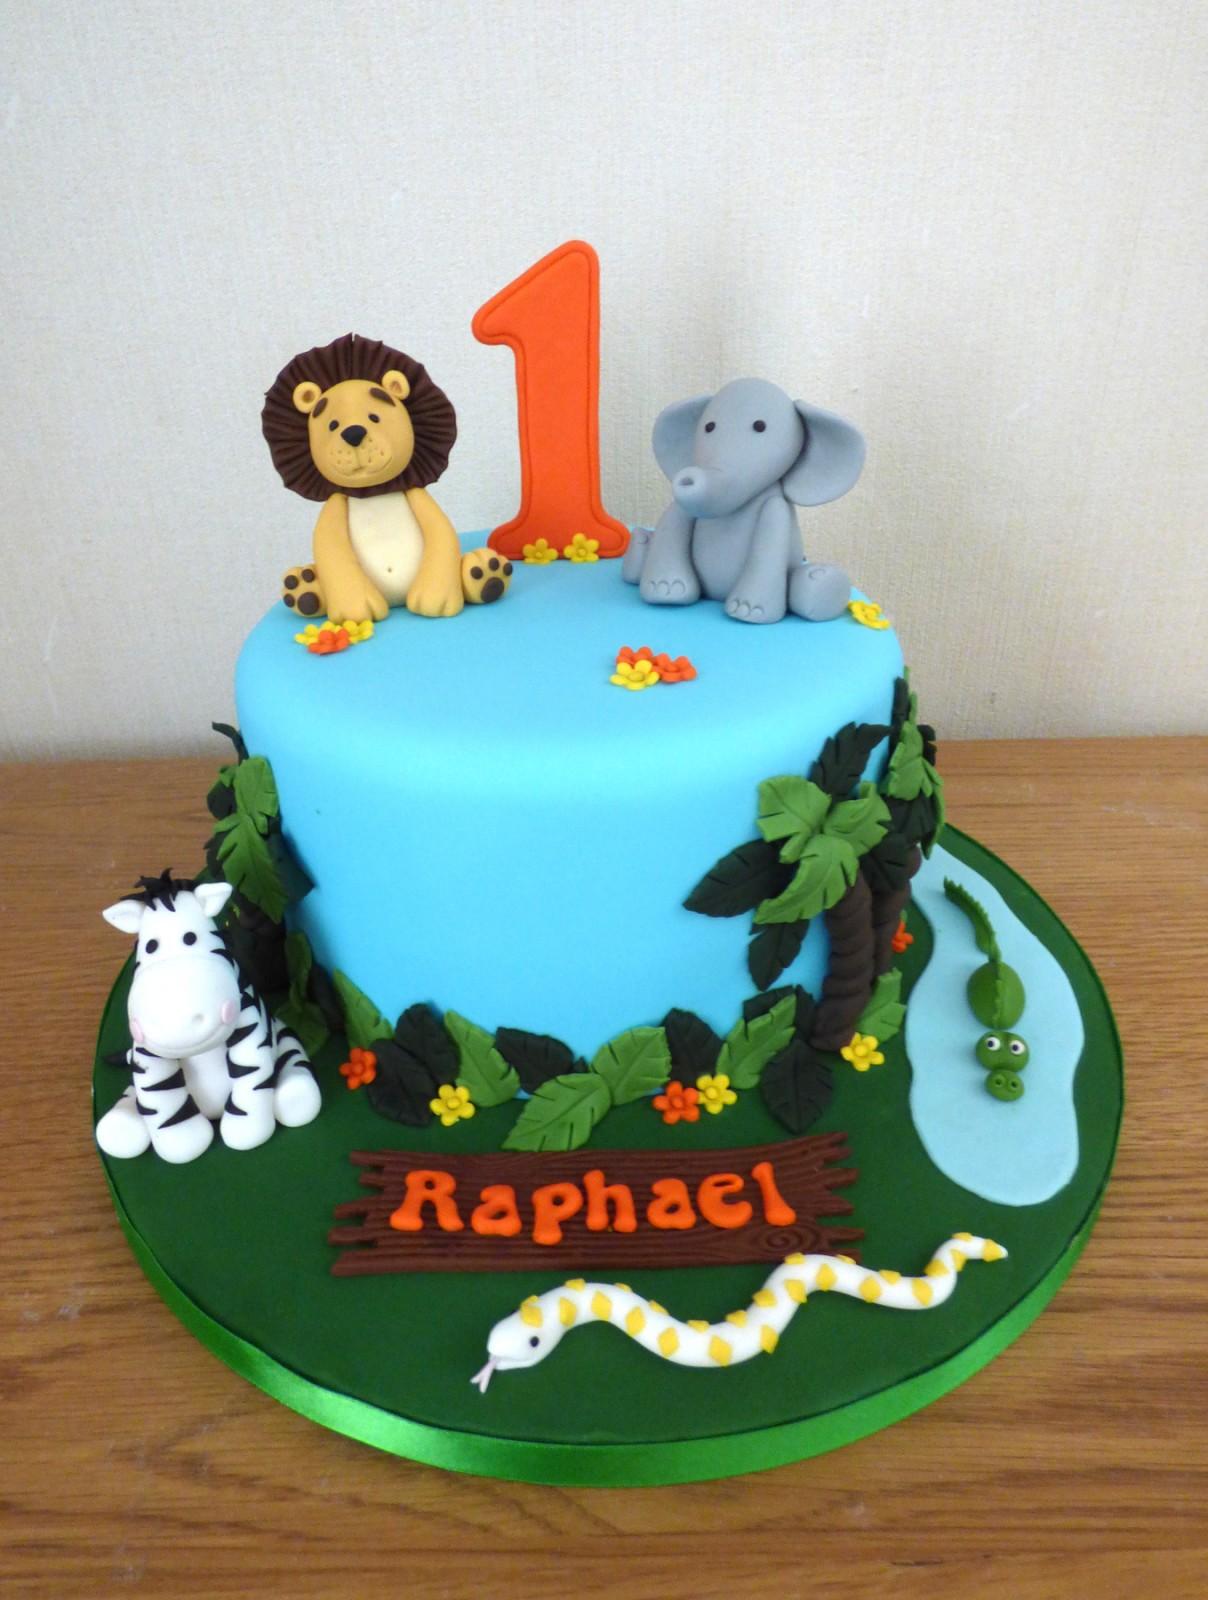 Sensational Jungle Animal Themed 1St Birthday Cake Susies Cakes Personalised Birthday Cards Bromeletsinfo